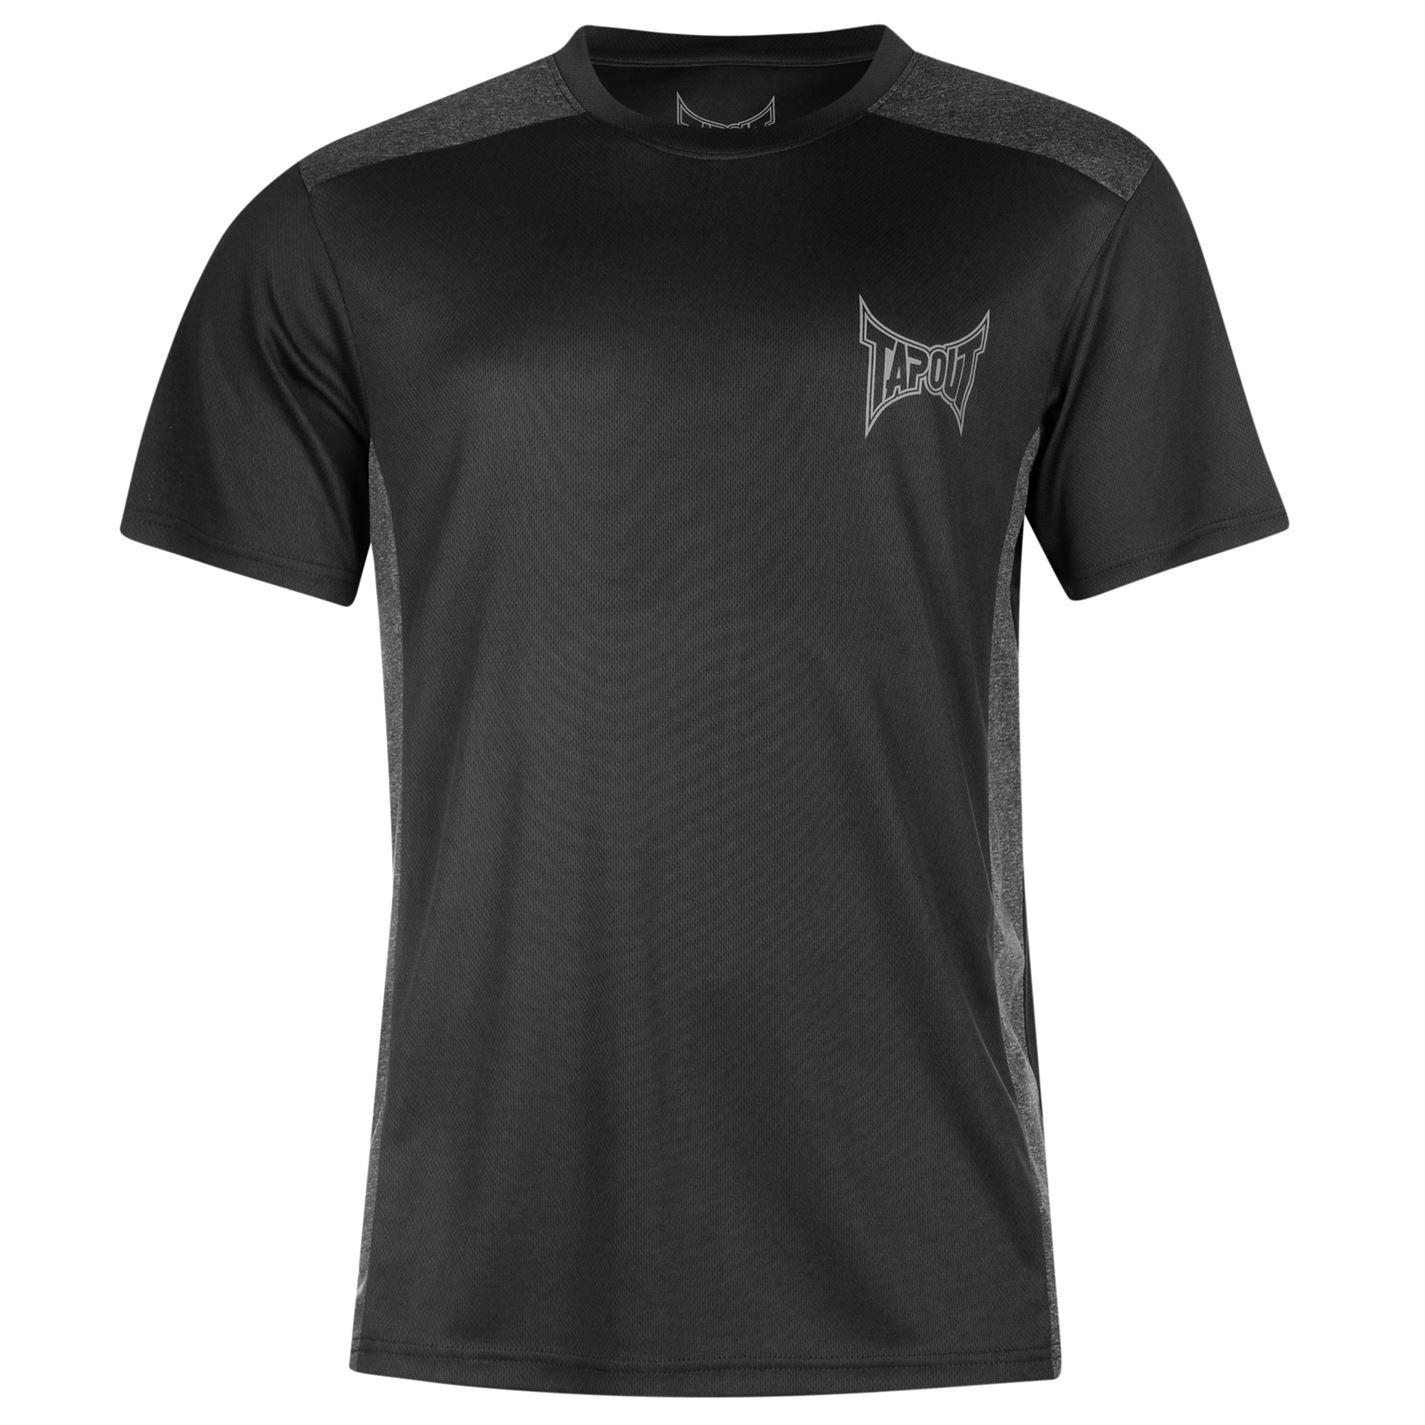 T Shirt Design Panaple